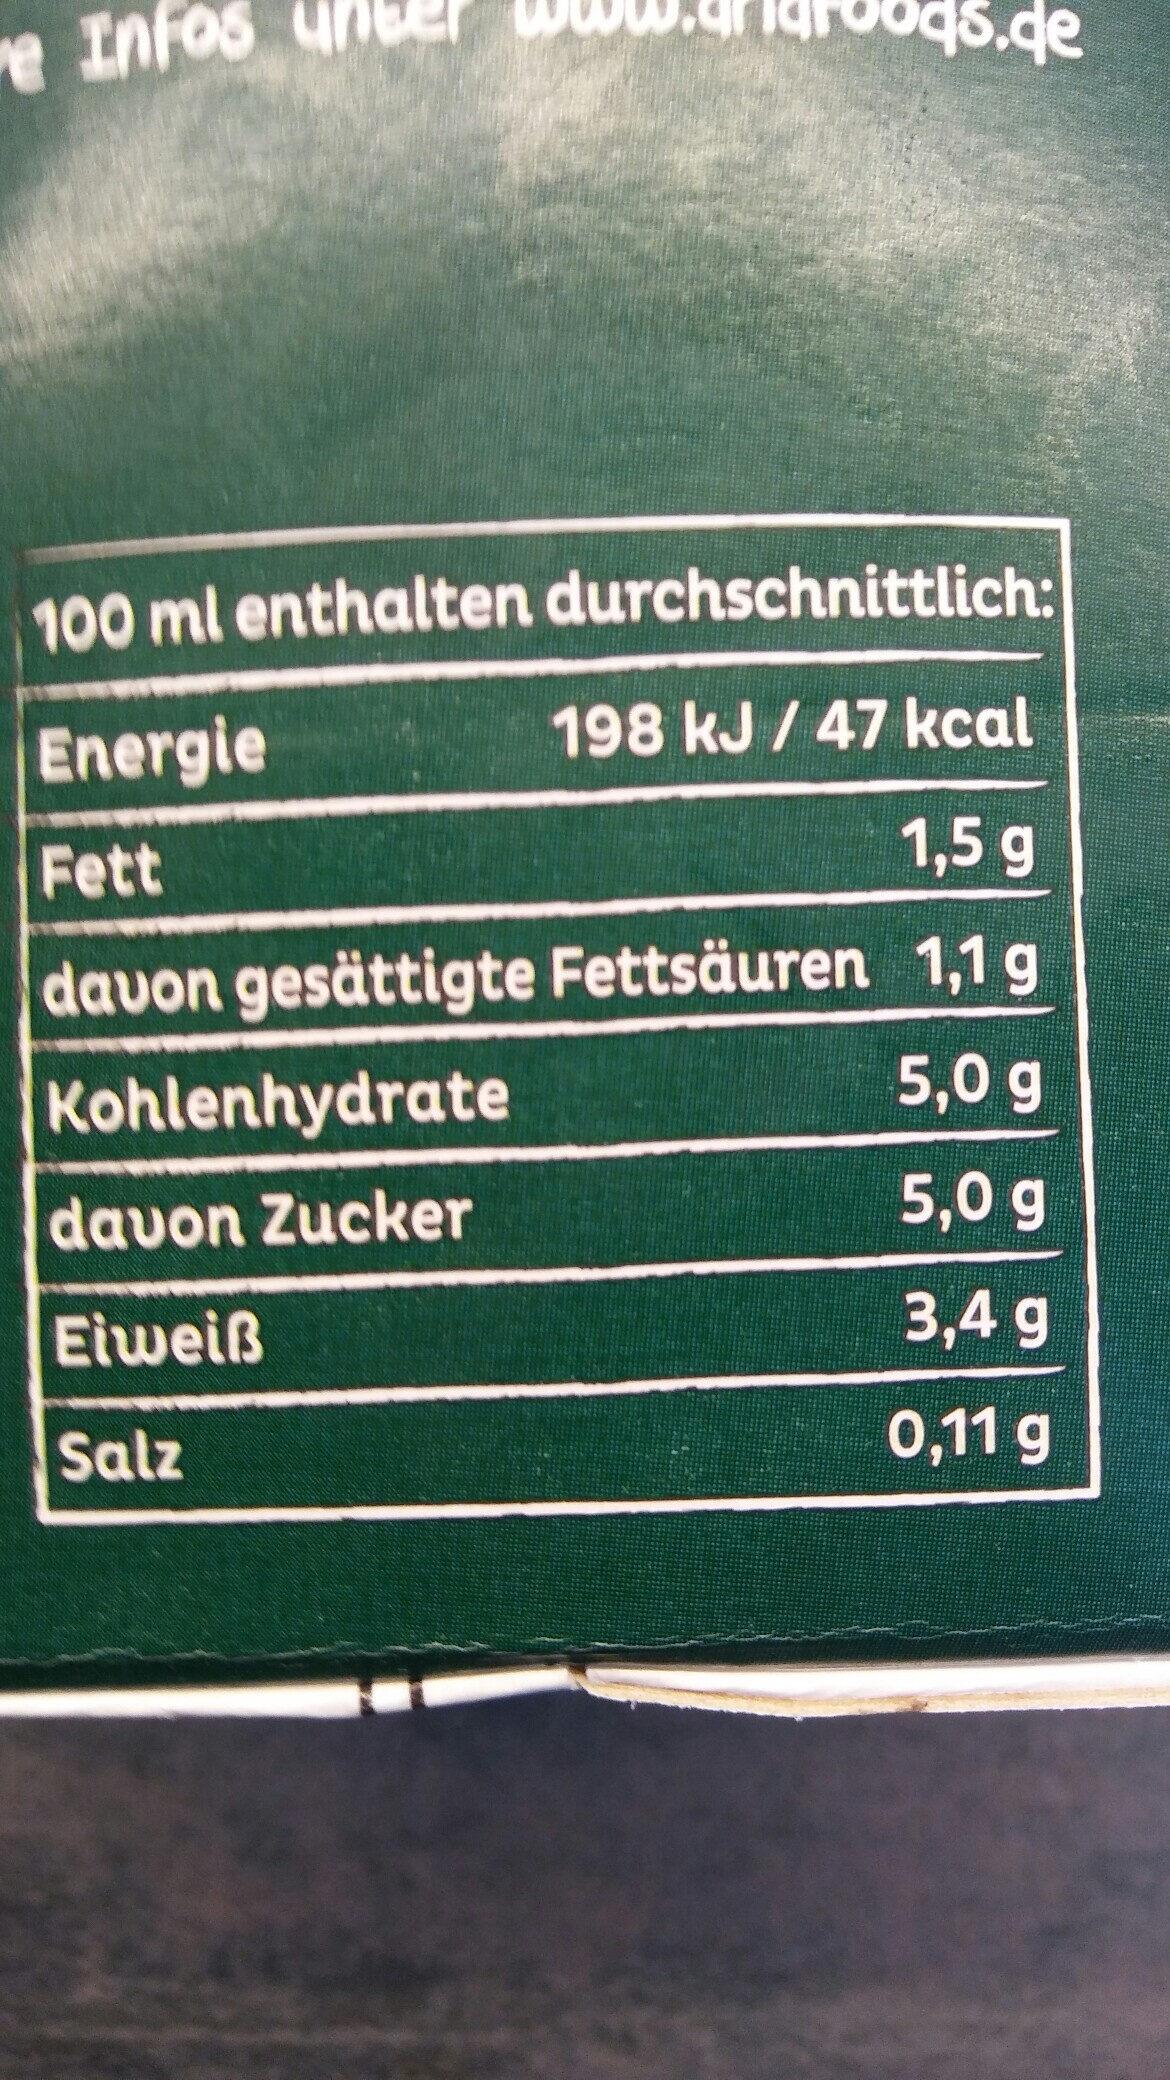 Frische Weidemilch🌳 1.5% Fett - Voedingswaarden - de